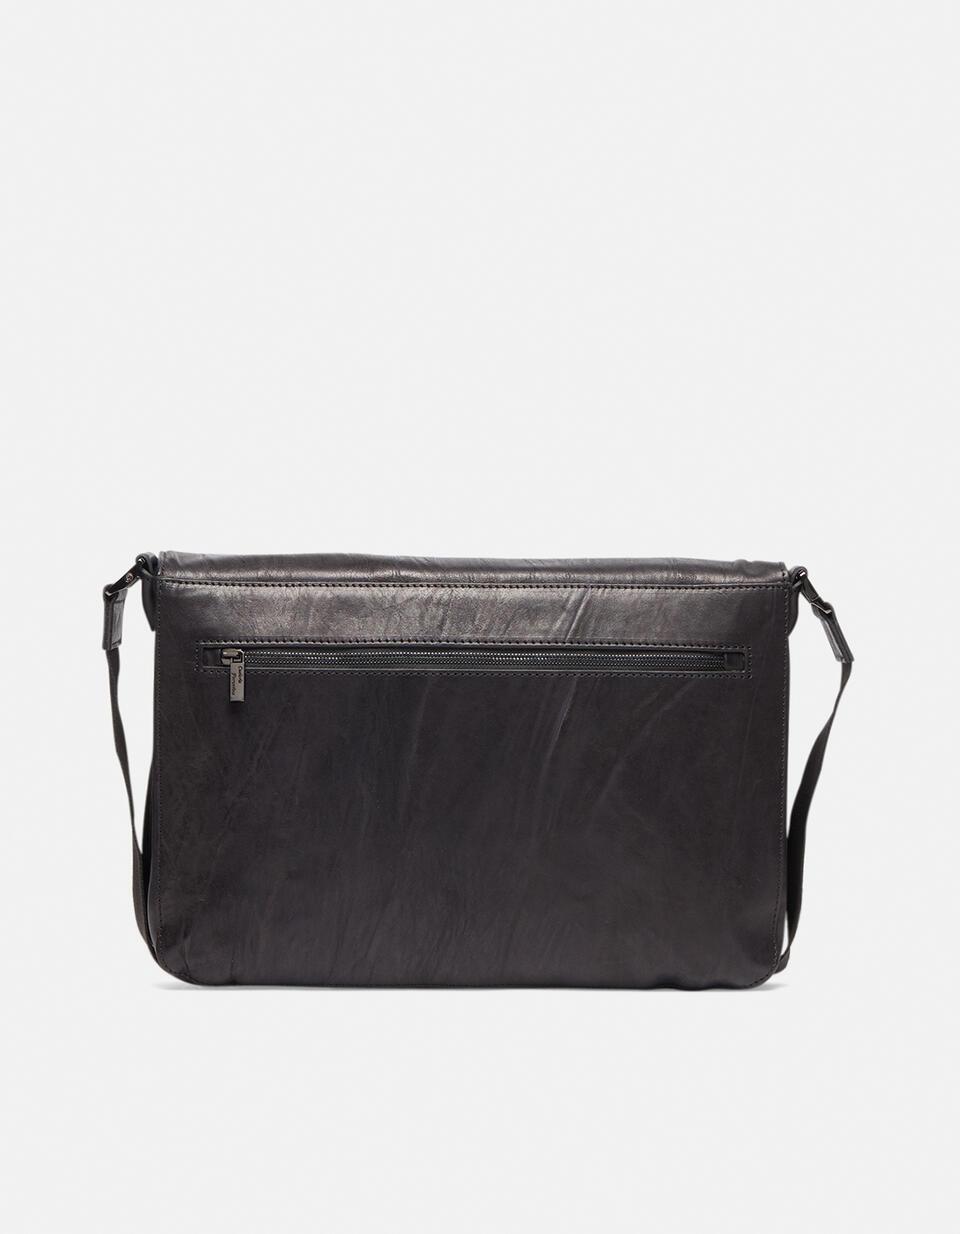 Bourbon leather large messenger bag in delavé leather NERO Cuoieria Fiorentina